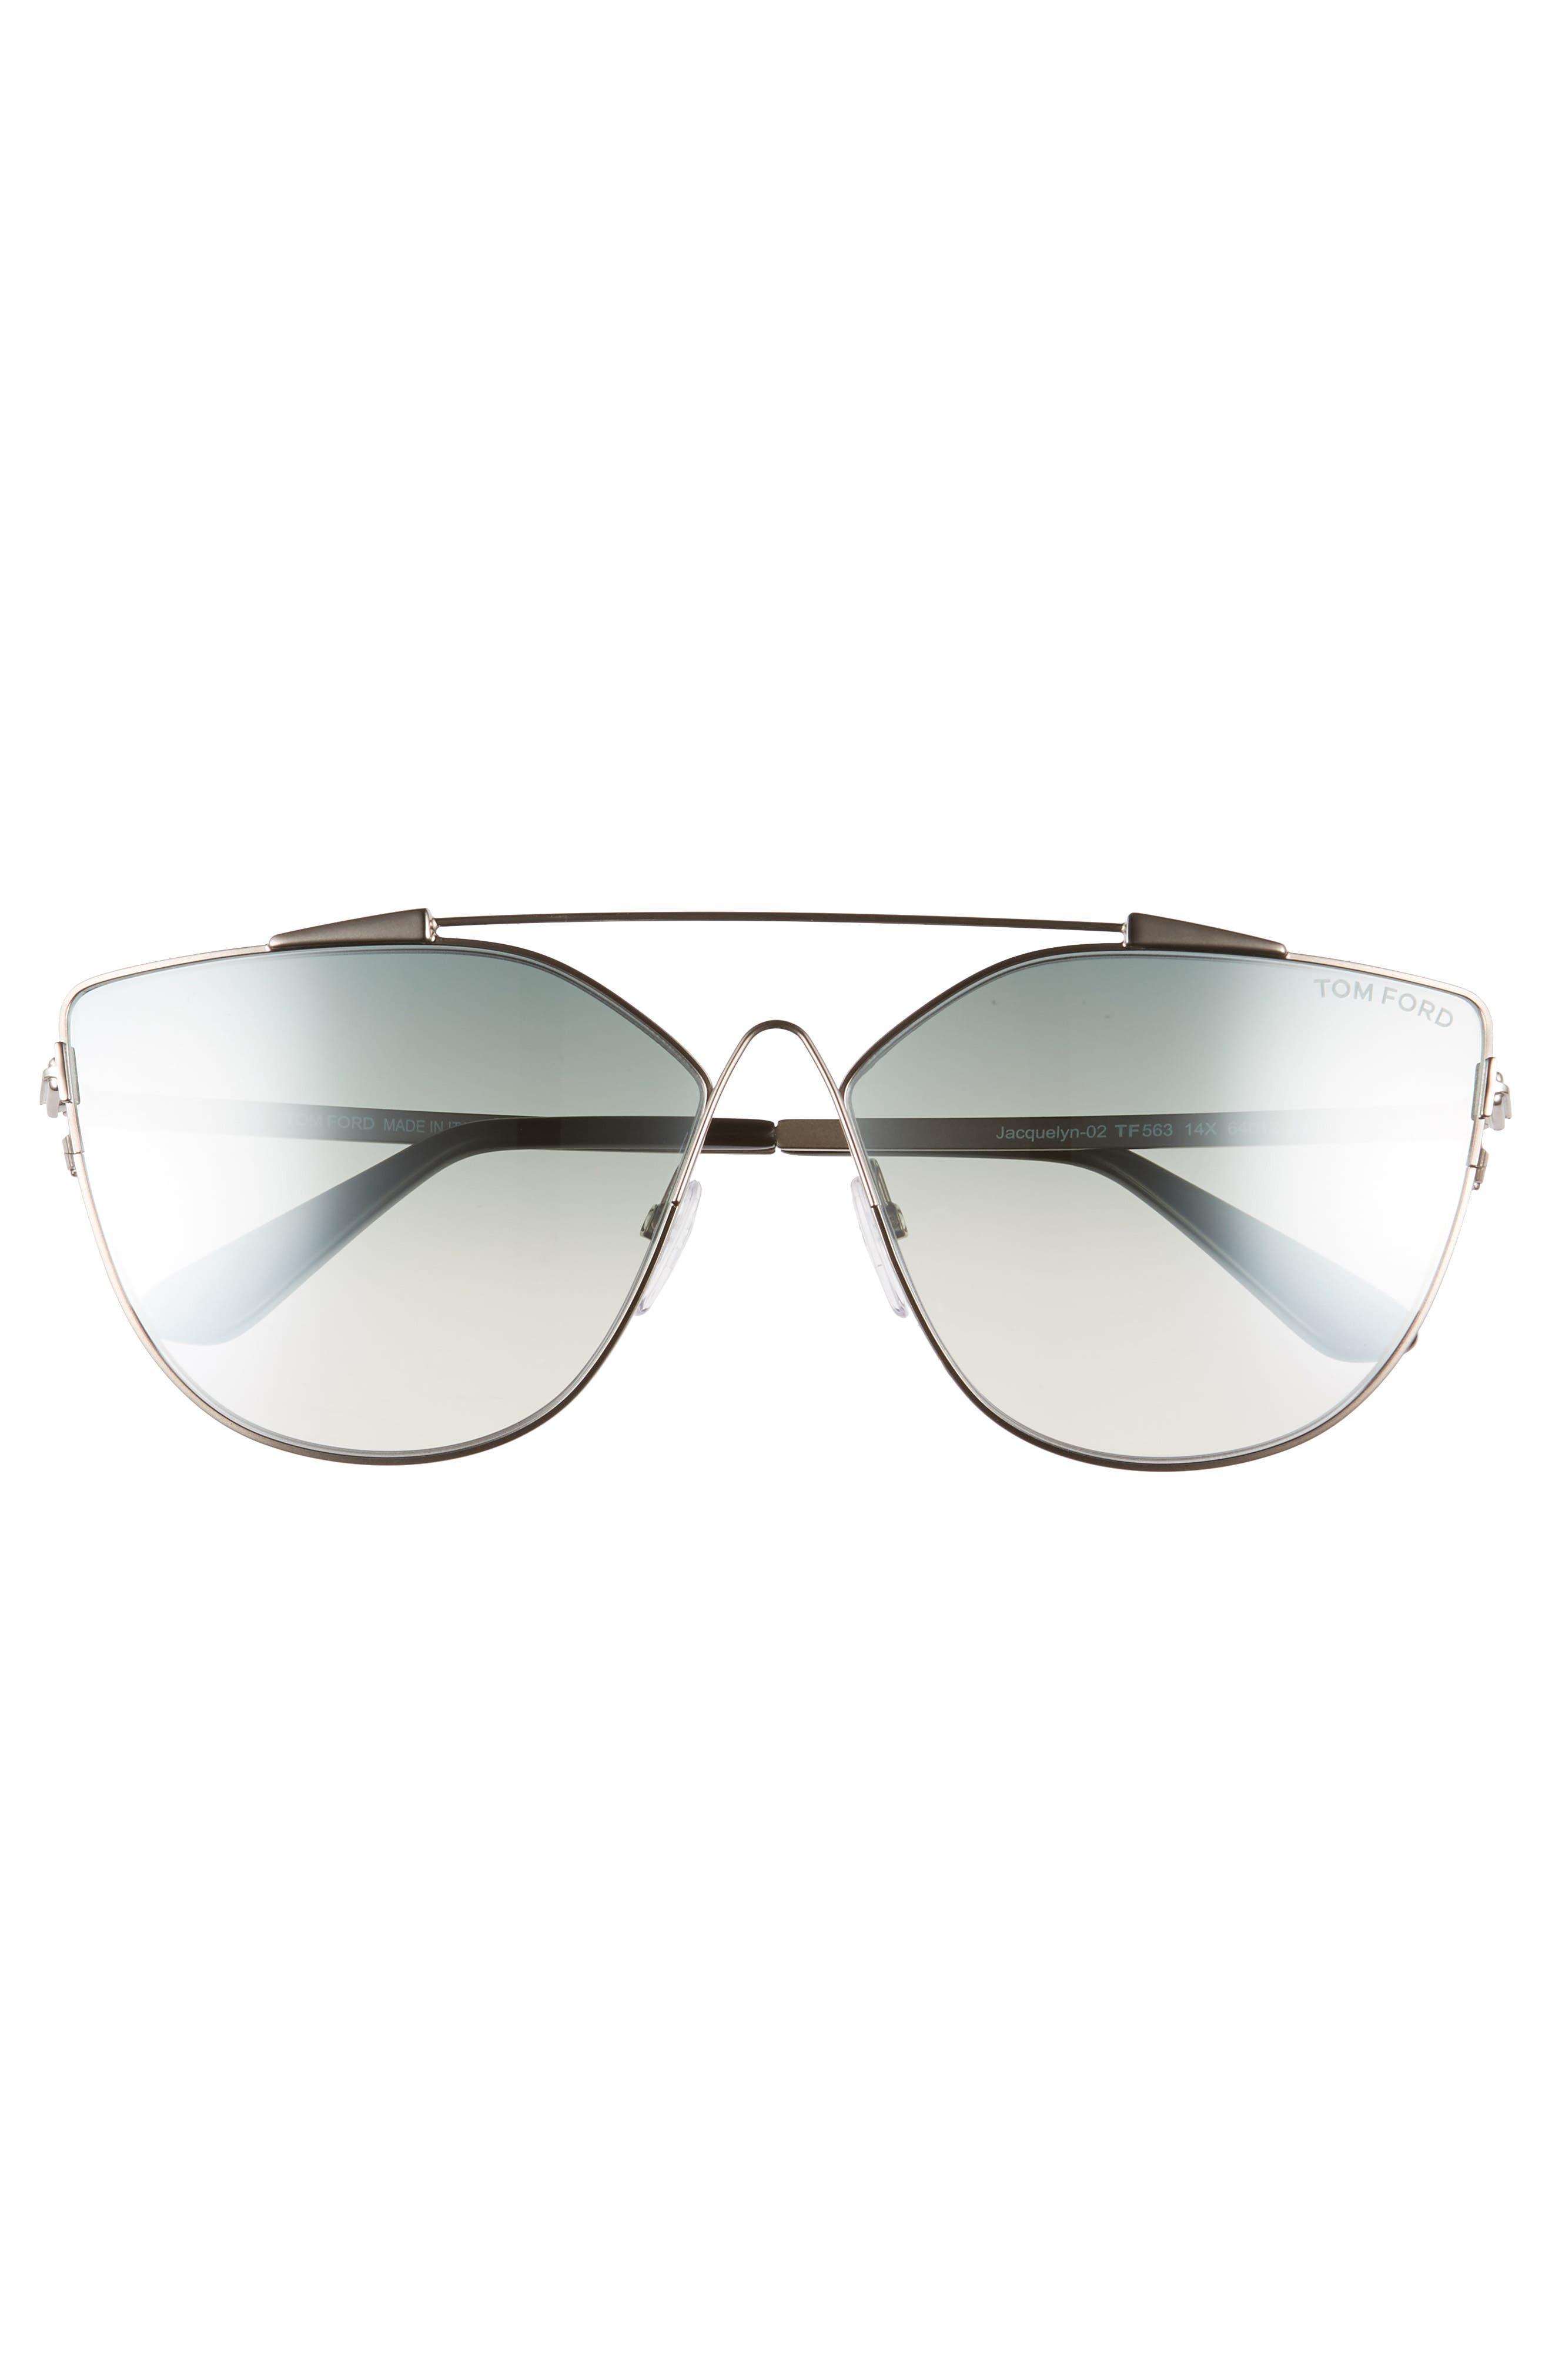 Jacquelyn 64mm Cat Eye Sunglasses,                             Alternate thumbnail 3, color,                             Light Ruthenium/ Blue Mirror